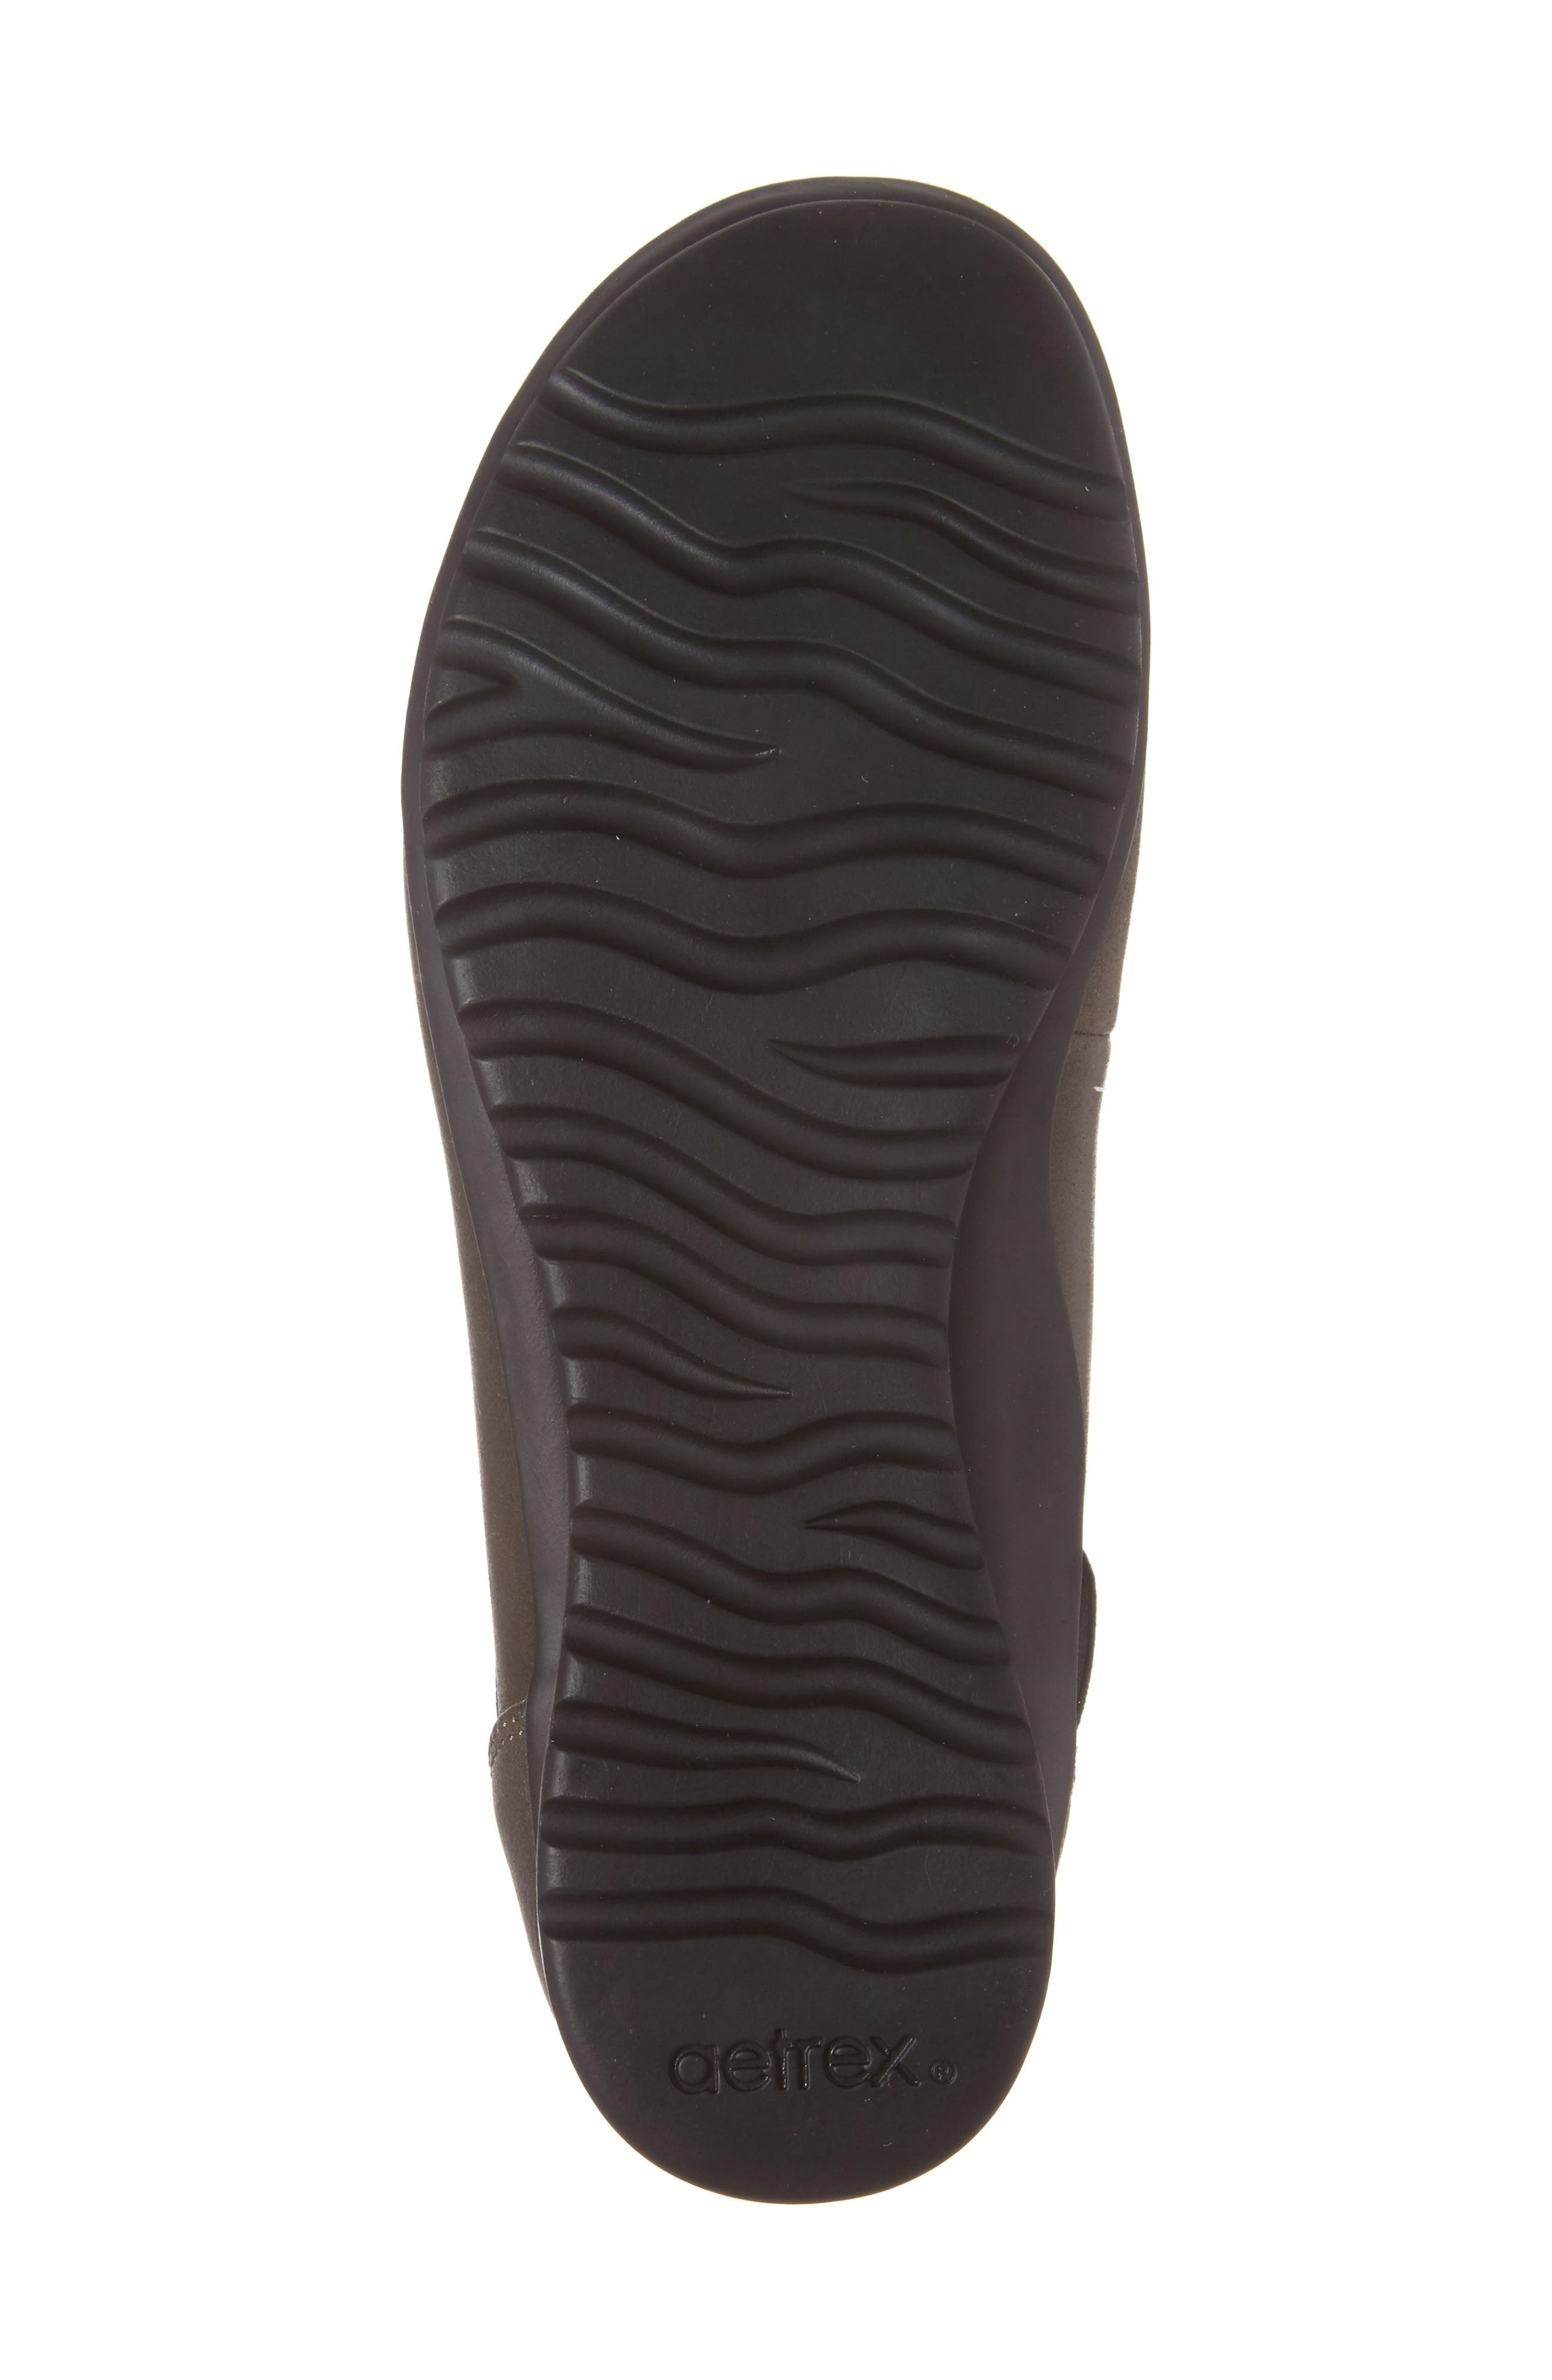 'Dakota' Ankle Strap Ballet Flat,                             Alternate thumbnail 6, color,                             Iron Leather